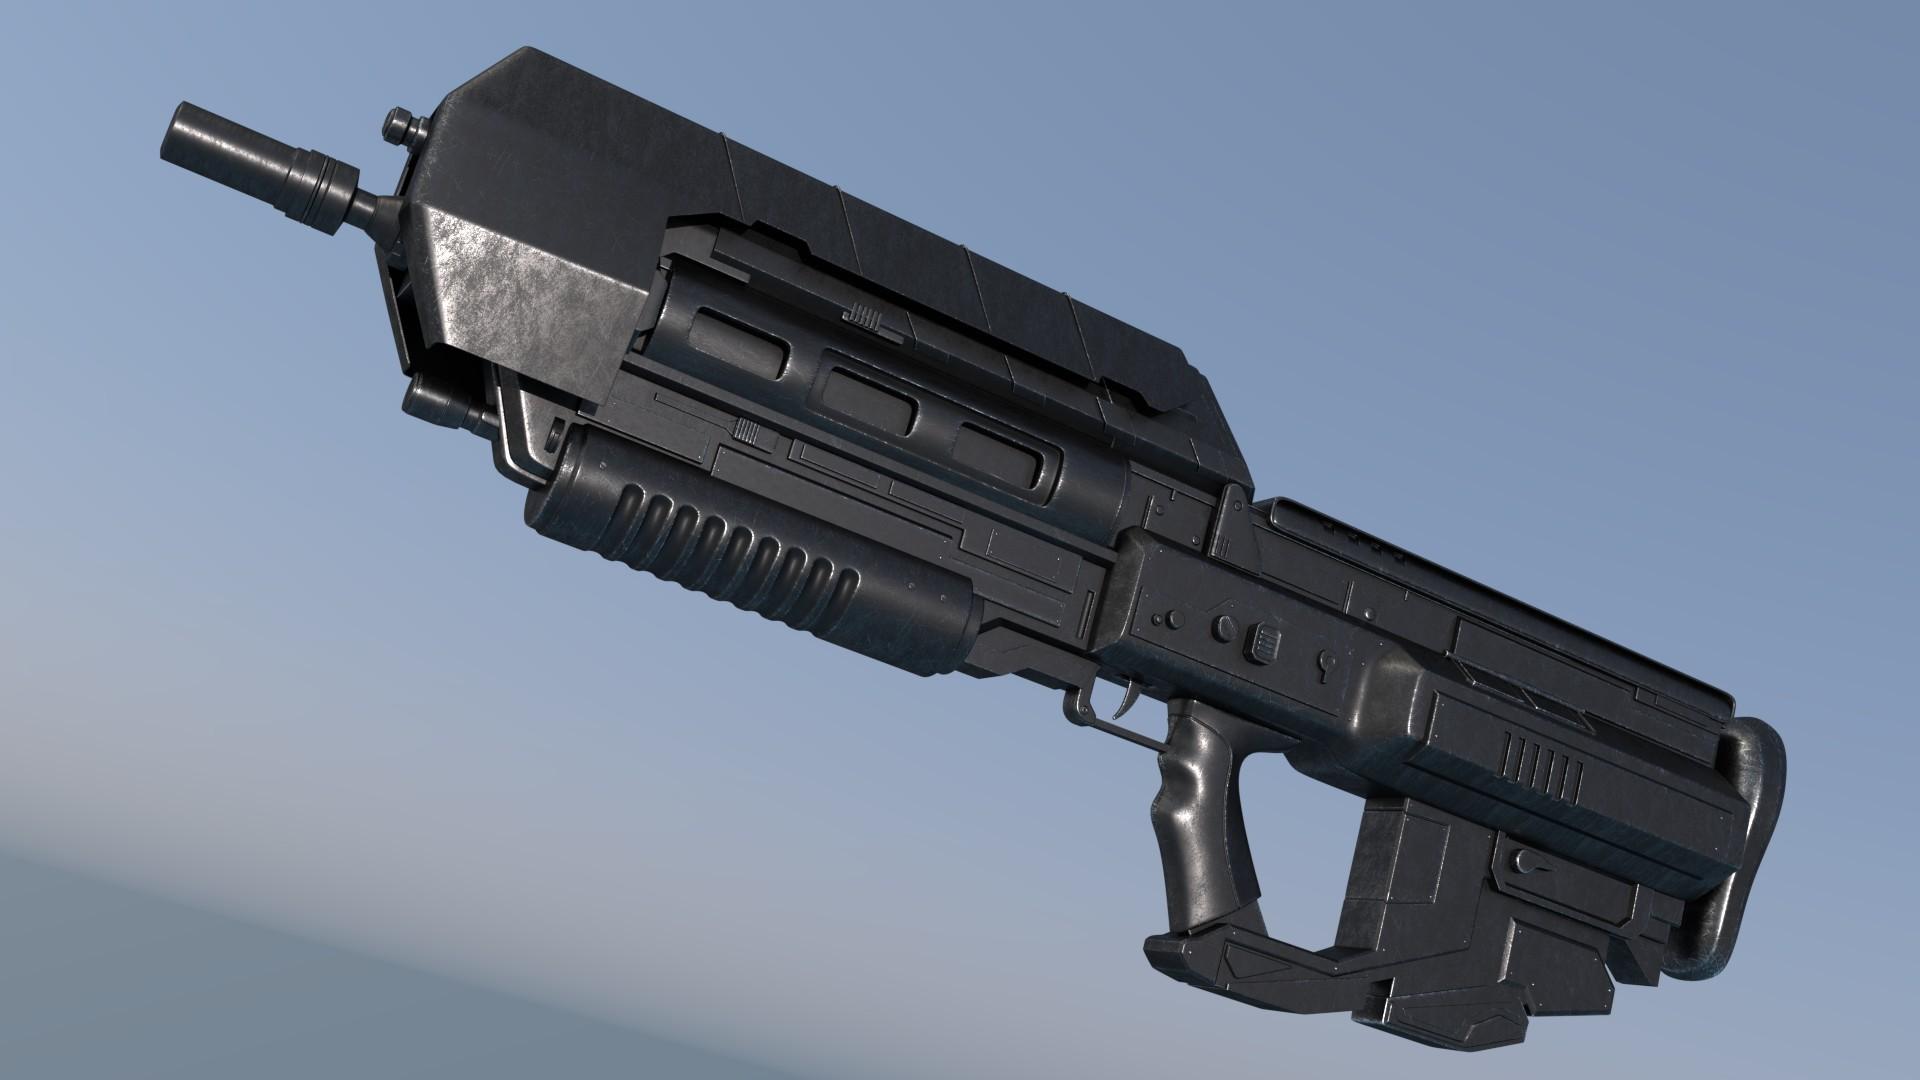 Francois rimasson rifle6